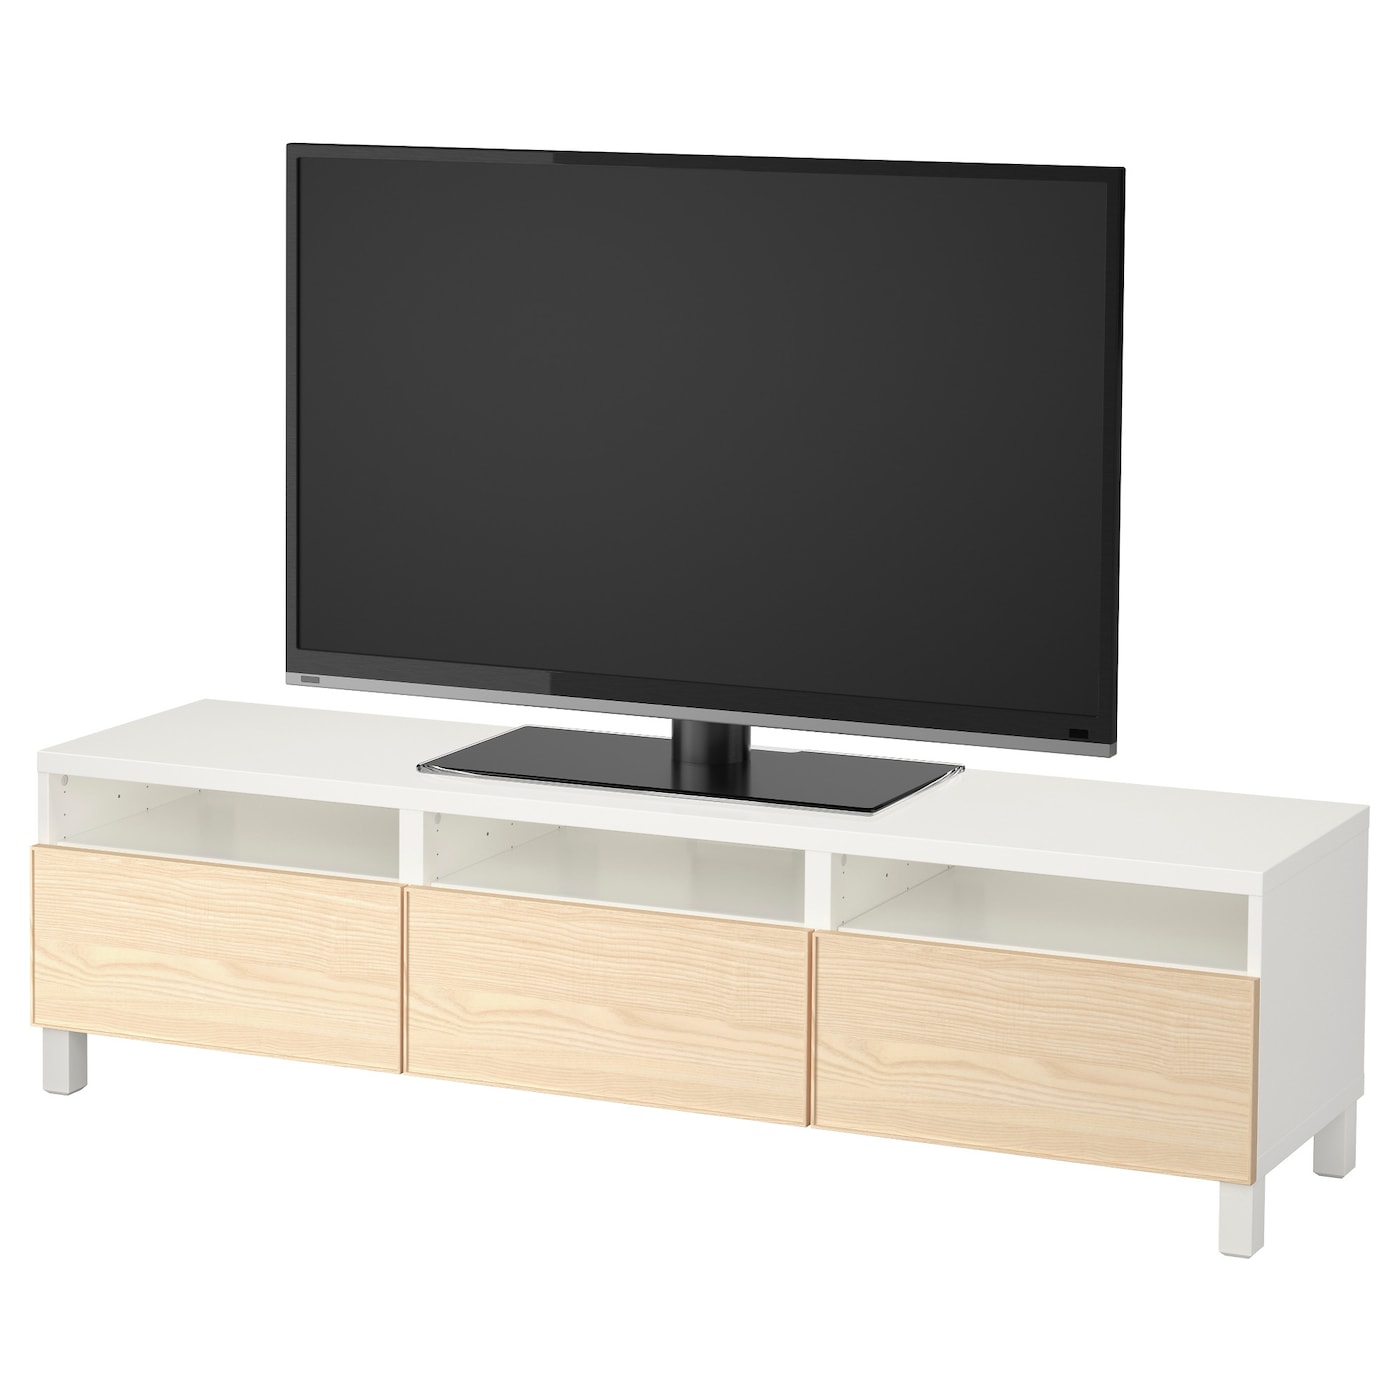 best tv bench with drawers white inviken ash veneer 180 x 40 x 48 cm ikea. Black Bedroom Furniture Sets. Home Design Ideas